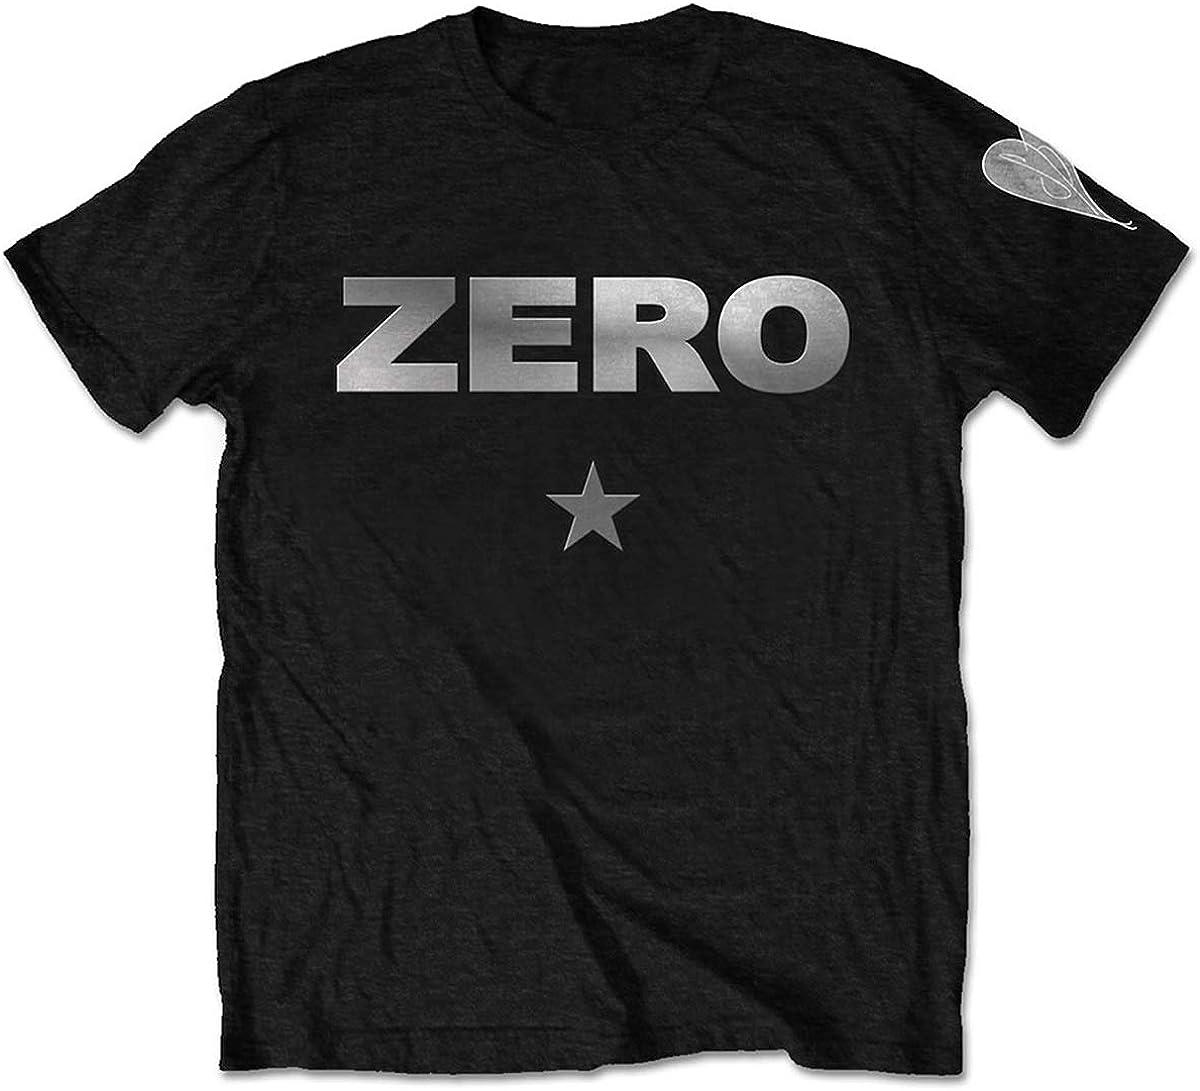 New popularity Smashing Pumpkins Men's Zero Black Slim 70% OFF Outlet Fit T-Shirt